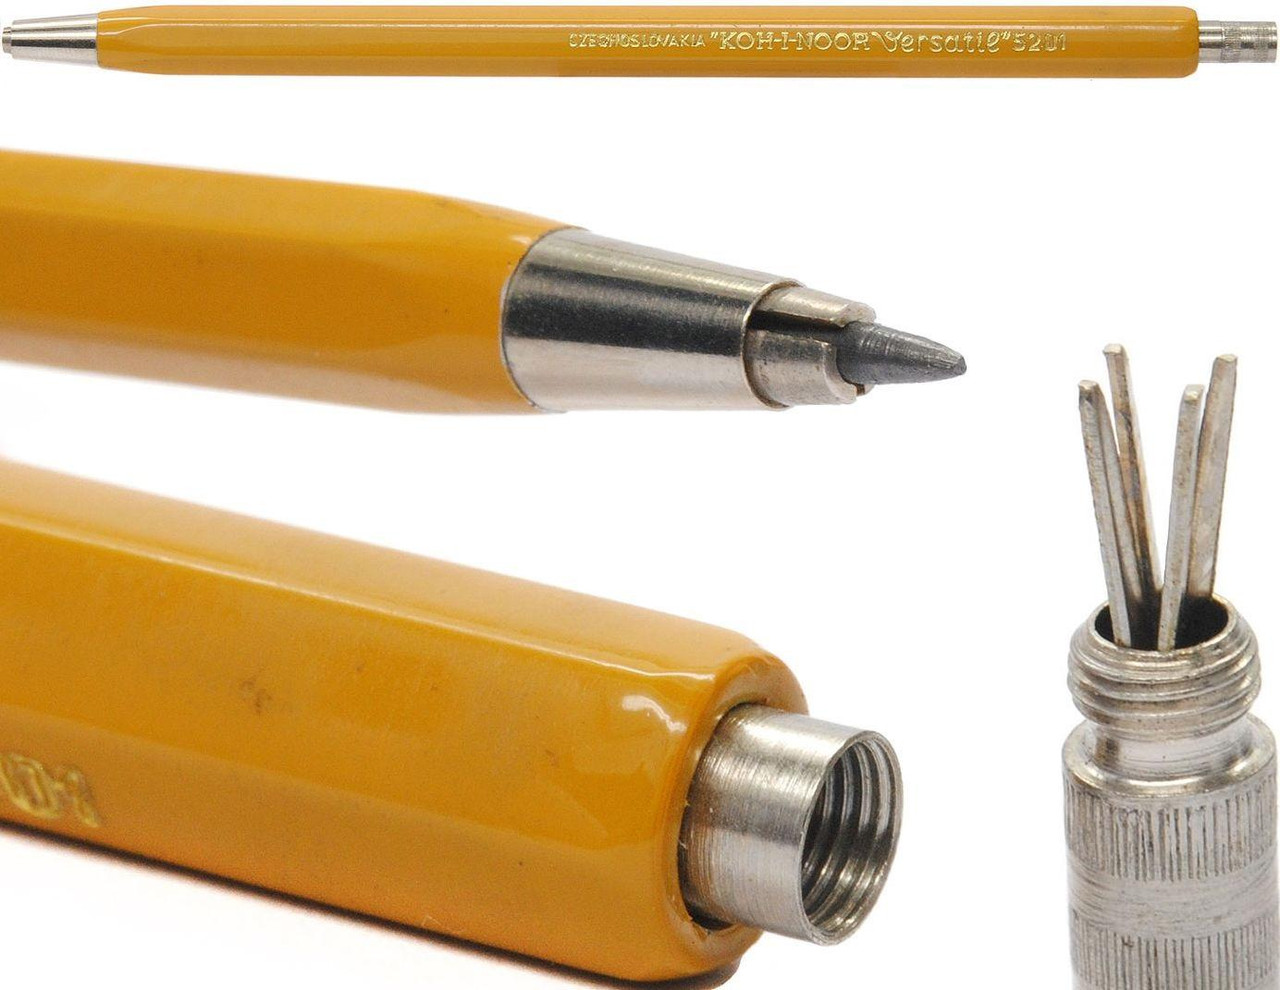 Цветной карандаш — википедия. что такое цветной карандаш